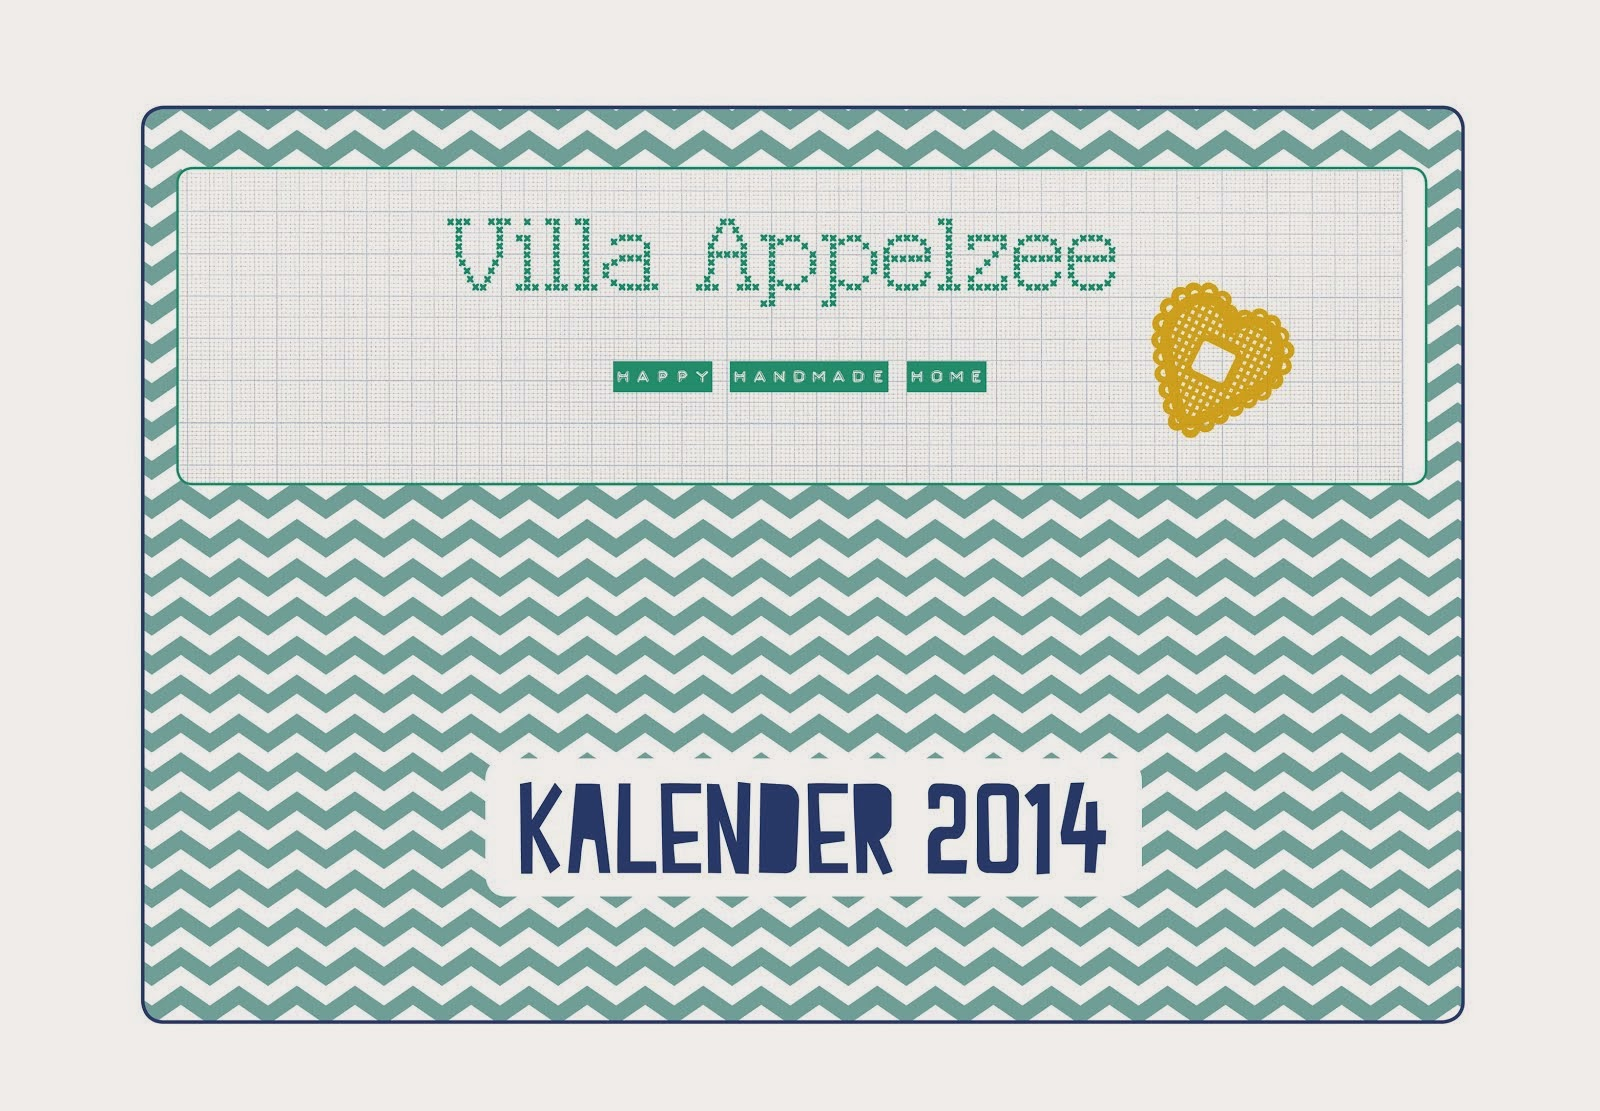 VILLA APPELZEE KALENDER 2014